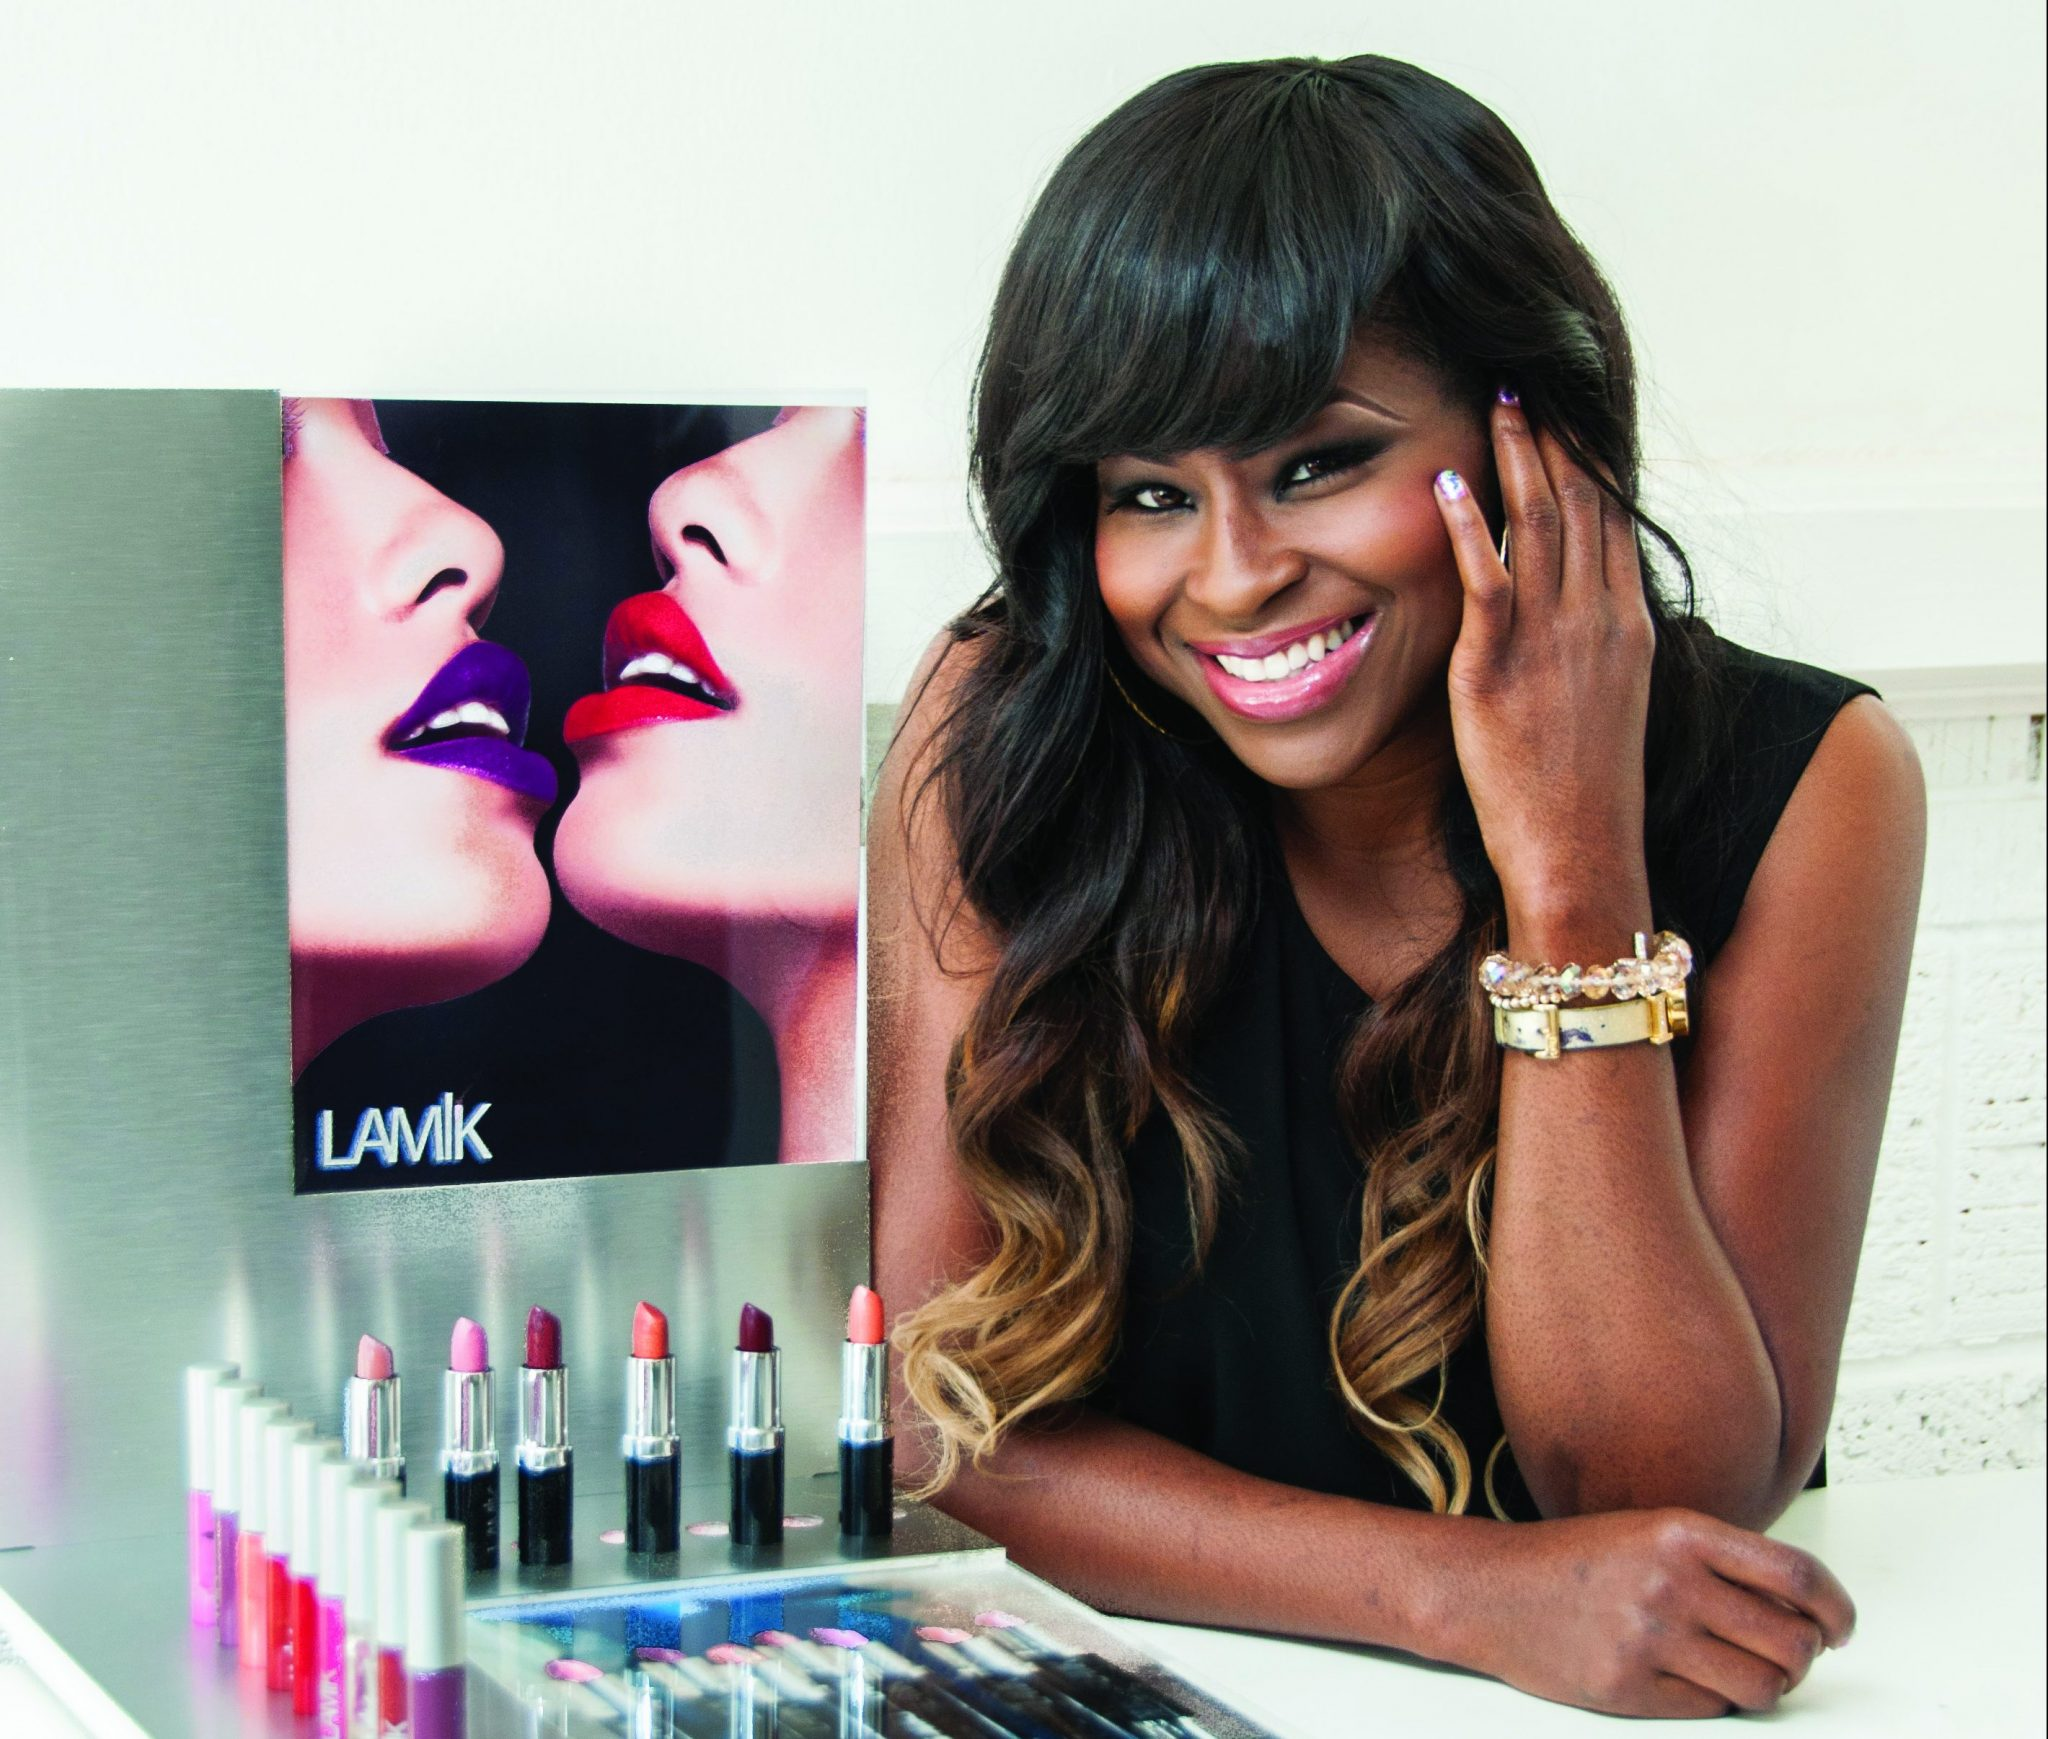 Lamik Beauty